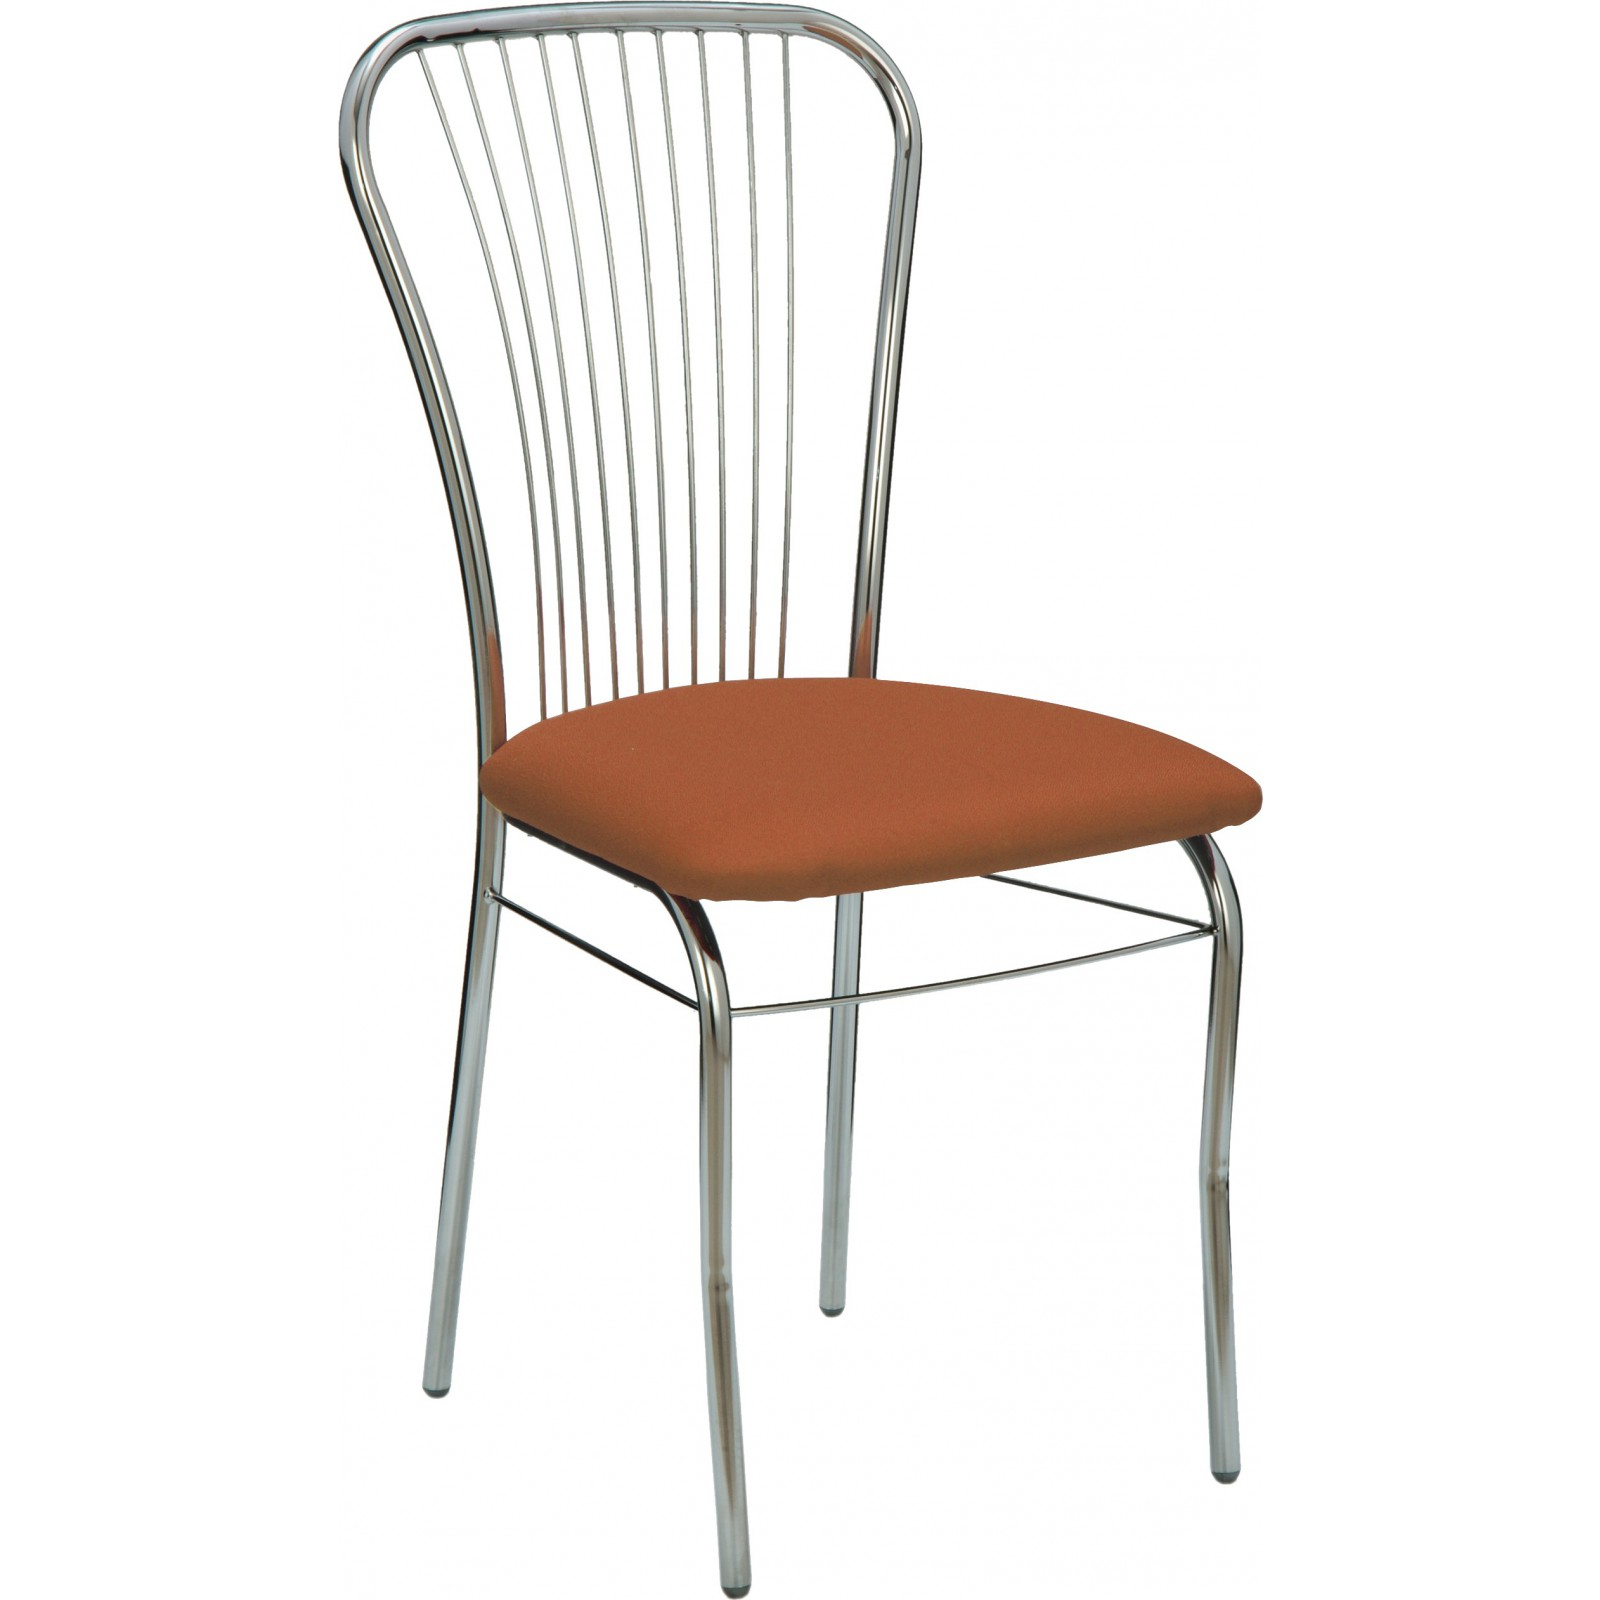 art metal furniture (amf) AMF Цезарь хром Неаполь N-04 (50643)